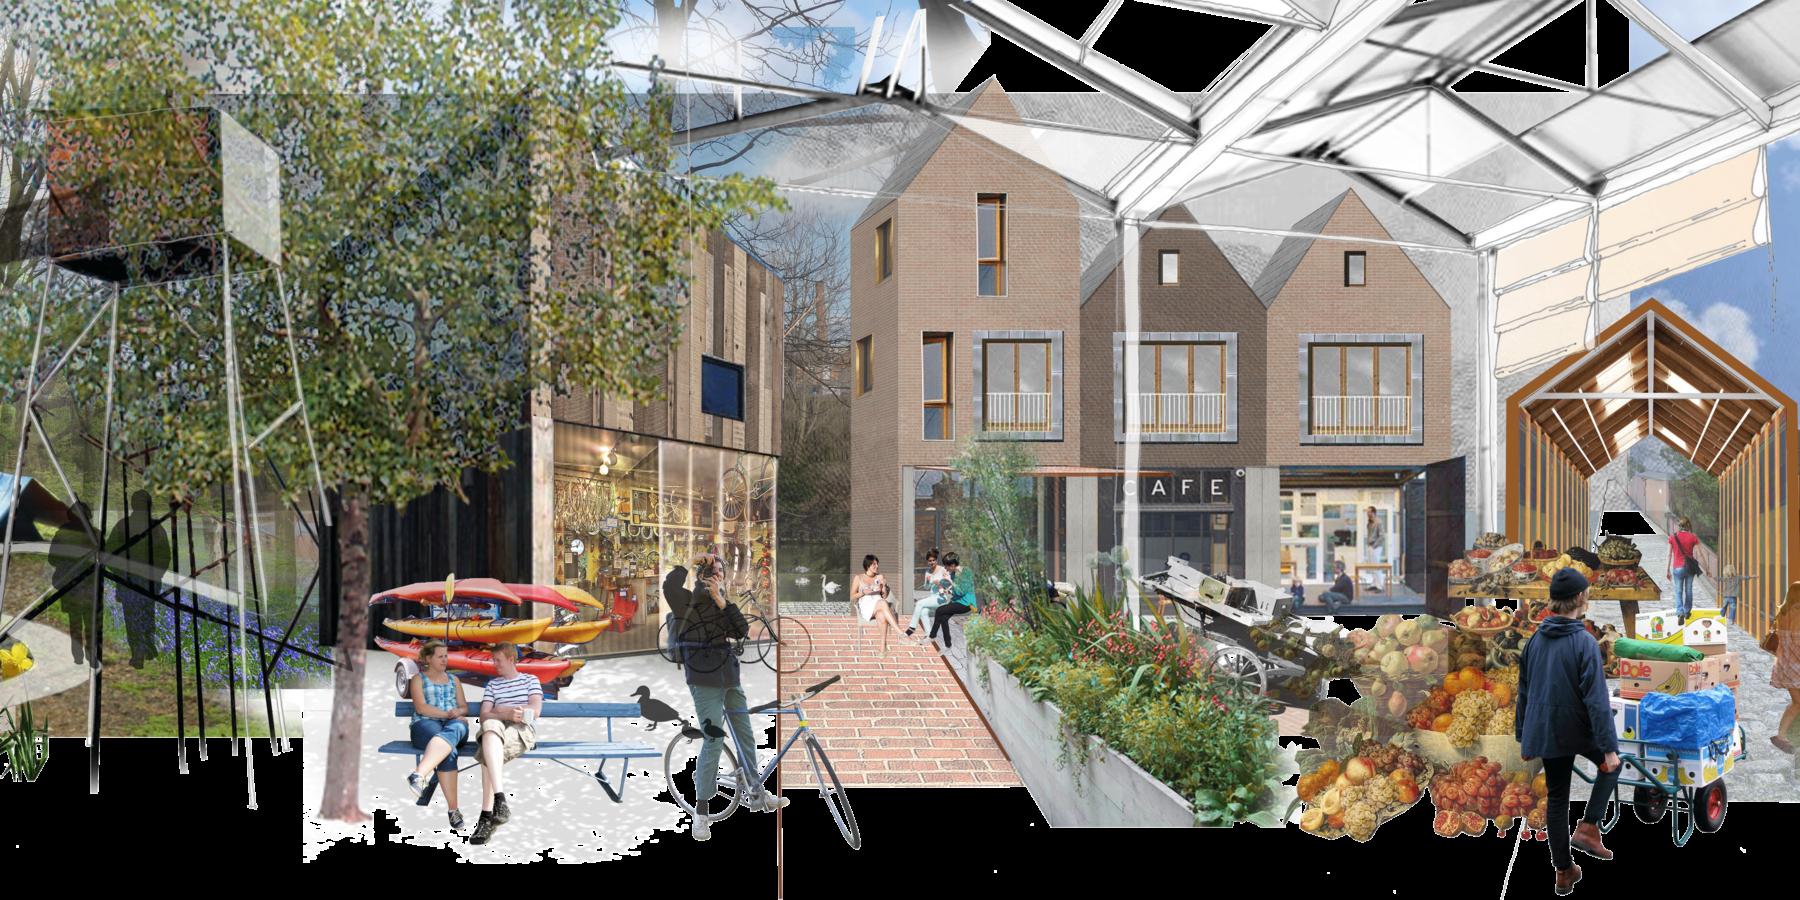 Sarah-Wigglesworth-Architects Soar Island3 3600